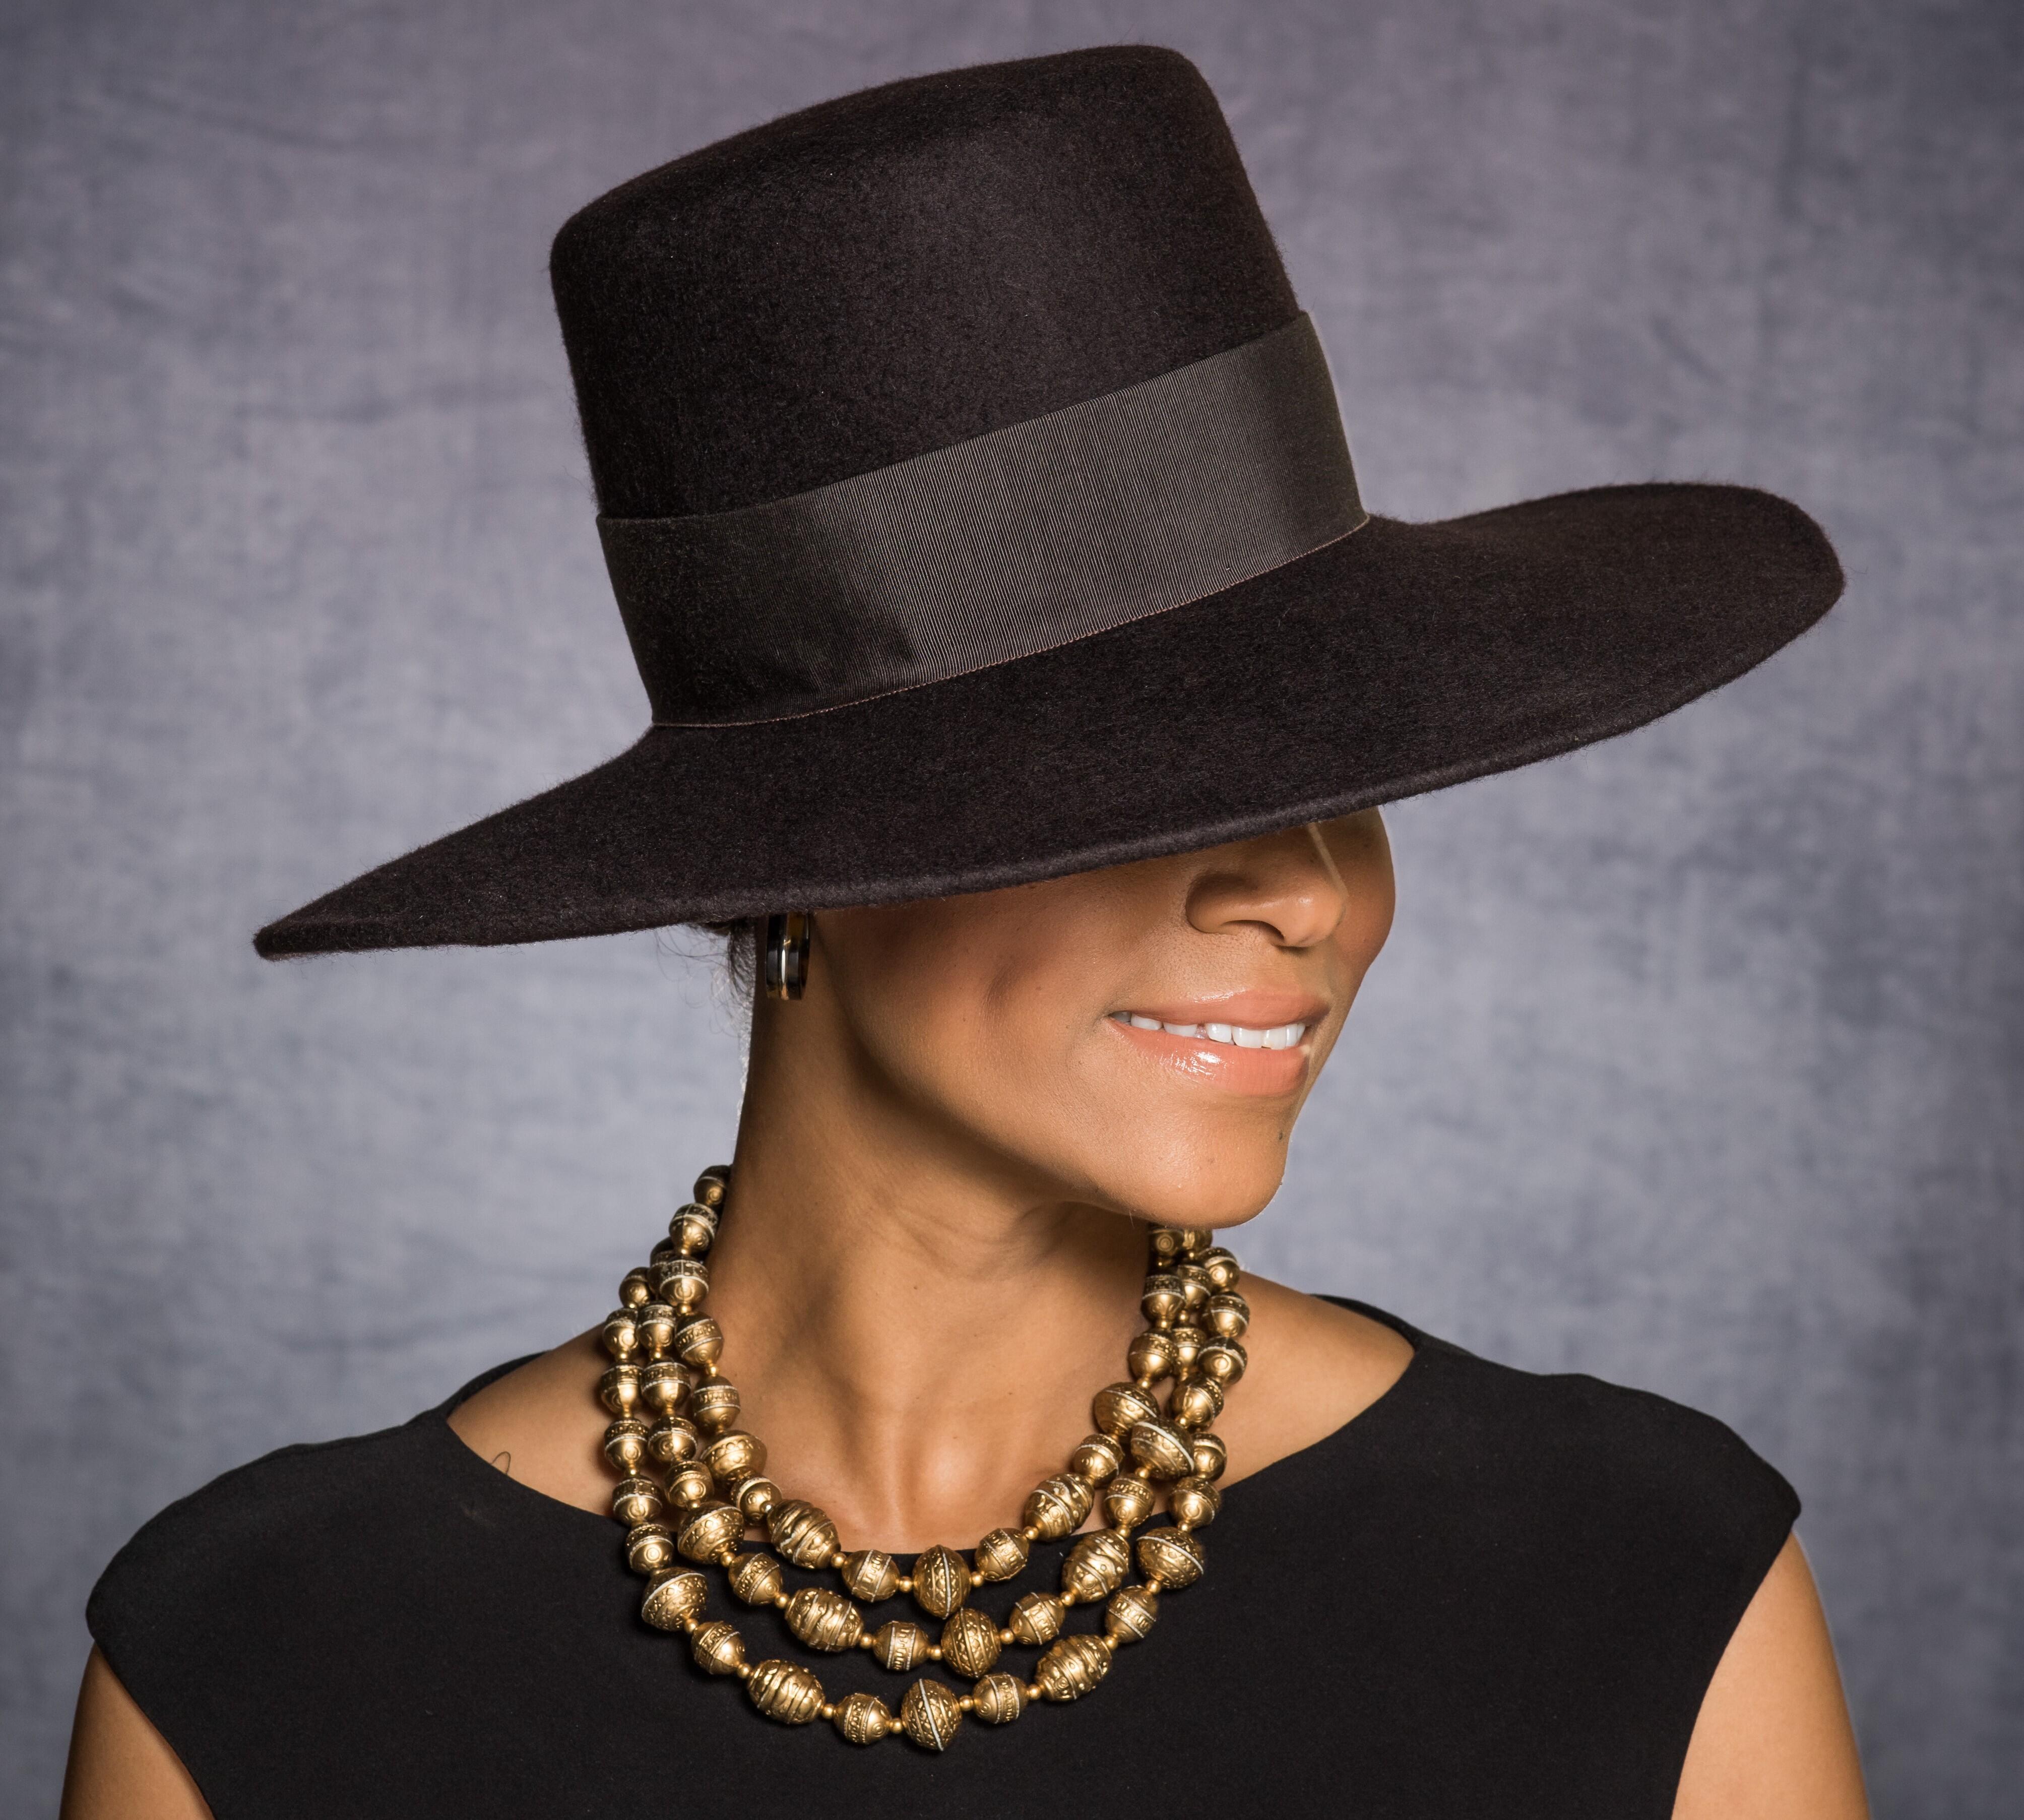 American_Hats_LLC_Photo - American Hats 1.jpg